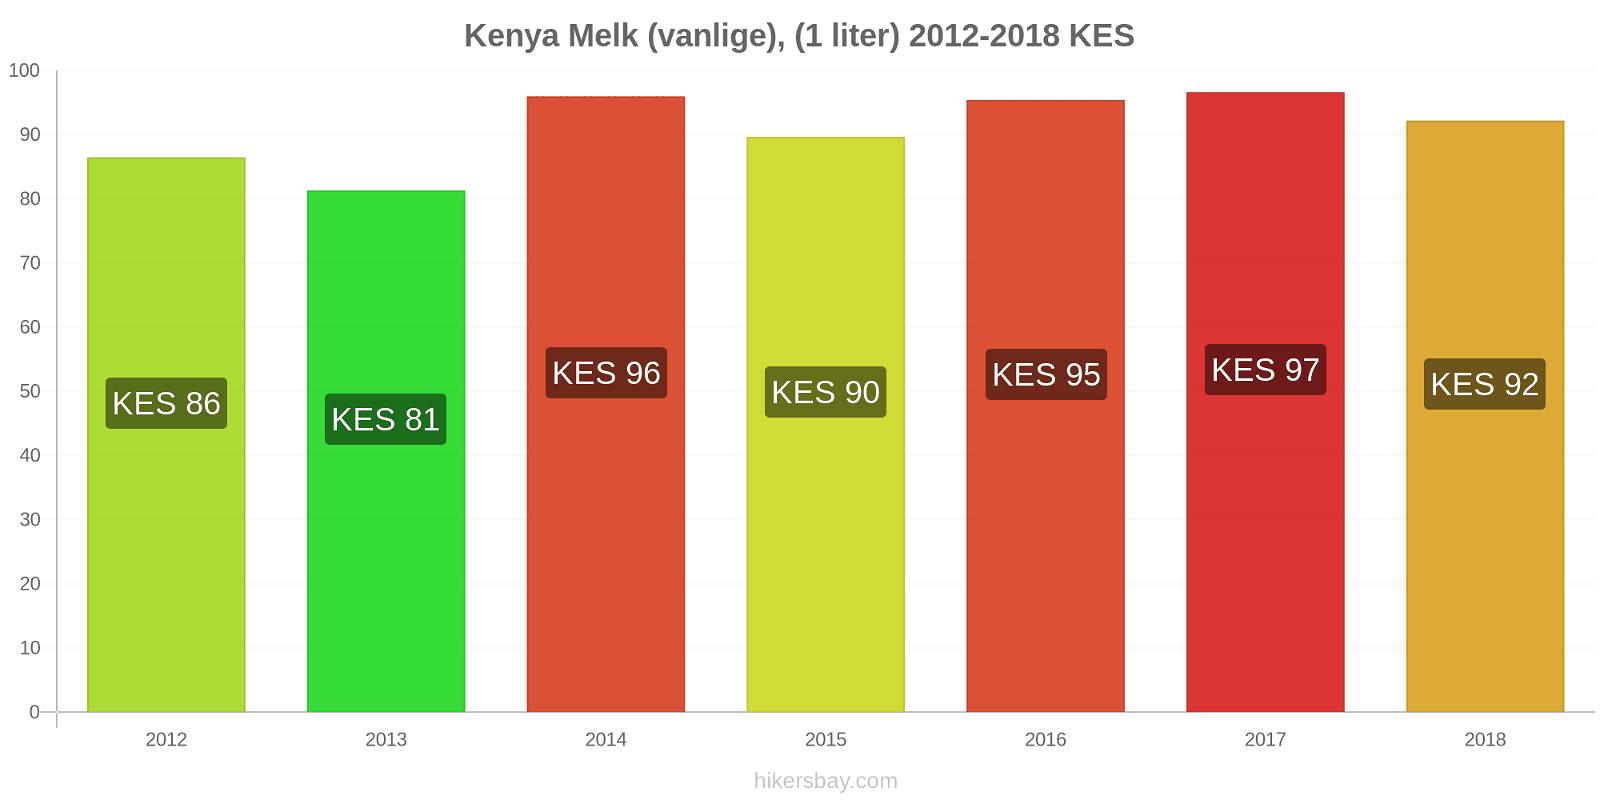 Kenya prisendringer Melk (vanlige), (1 liter) hikersbay.com